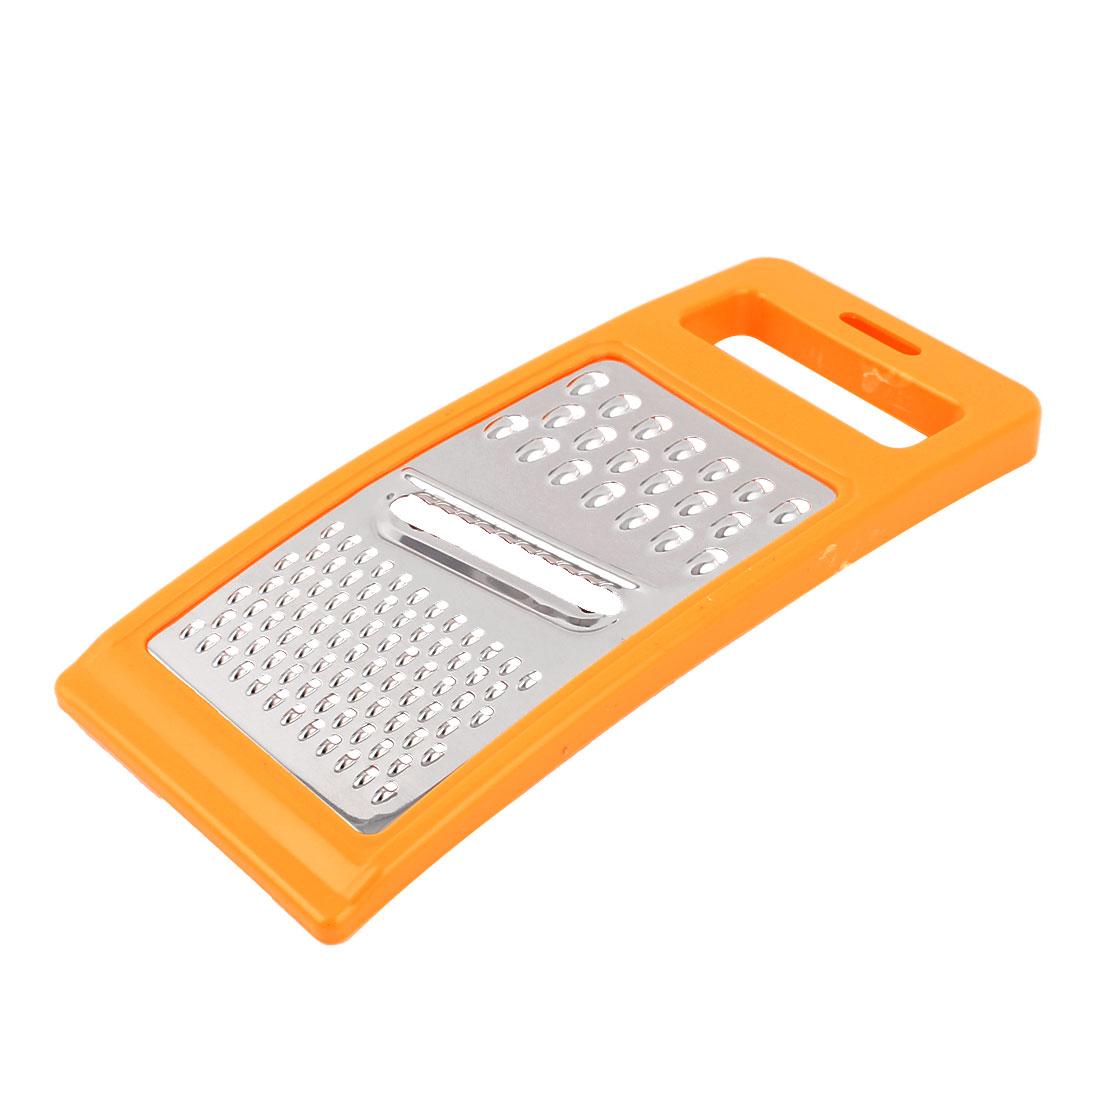 Multi-function Vegetable Grater Slice Cutter Peeler Kitchen Tool Orange